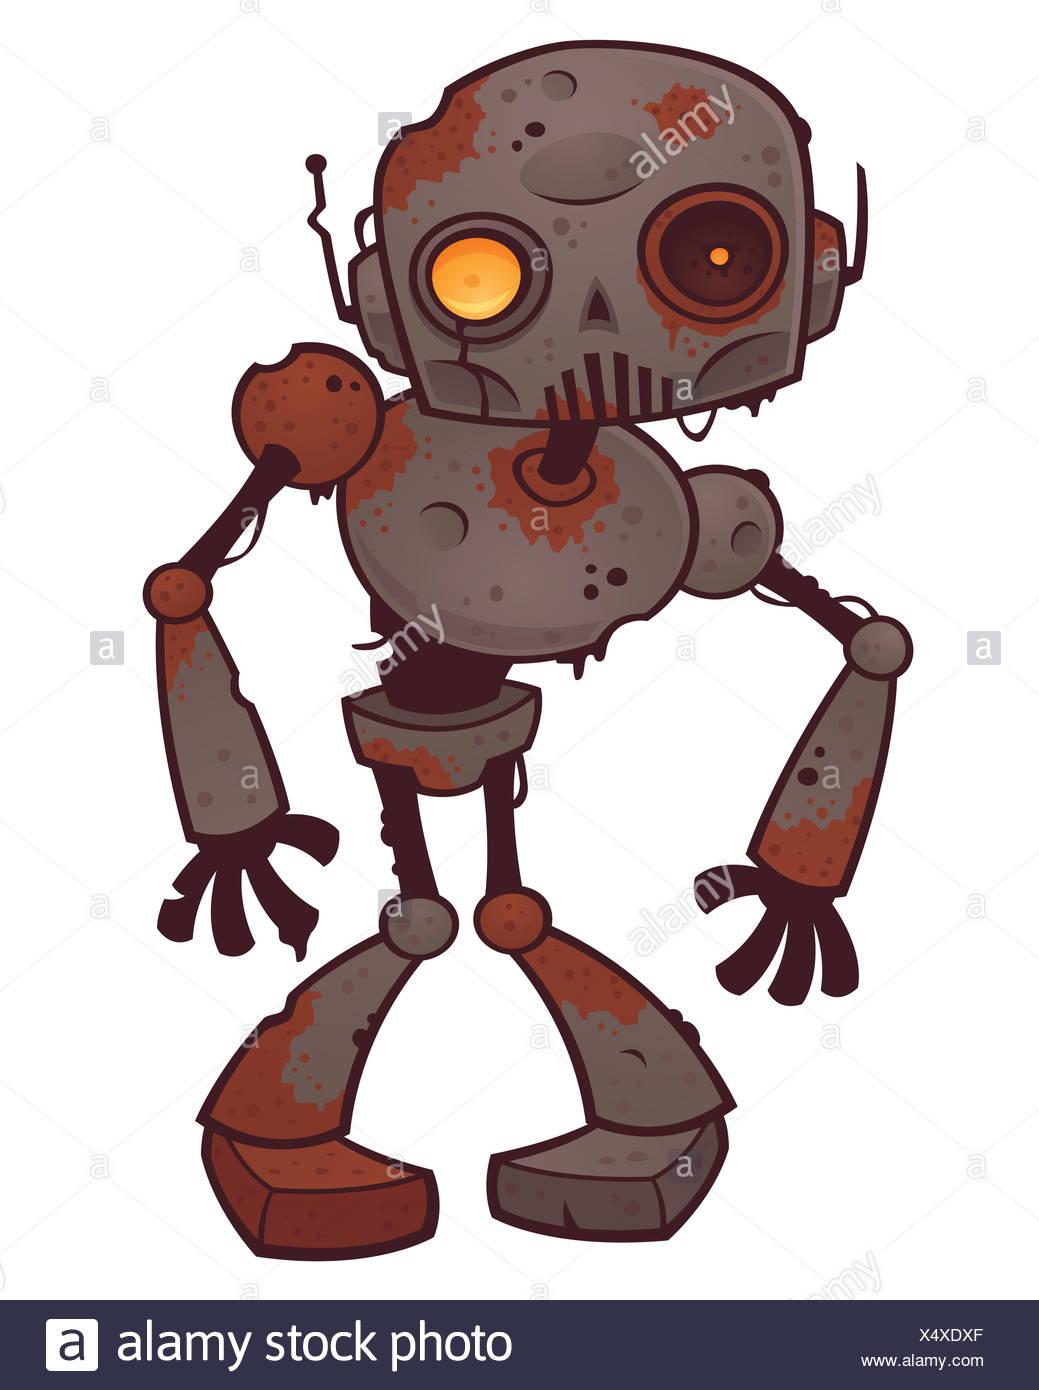 Rusty zombie robot foto & immagine stock: 278406199 alamy